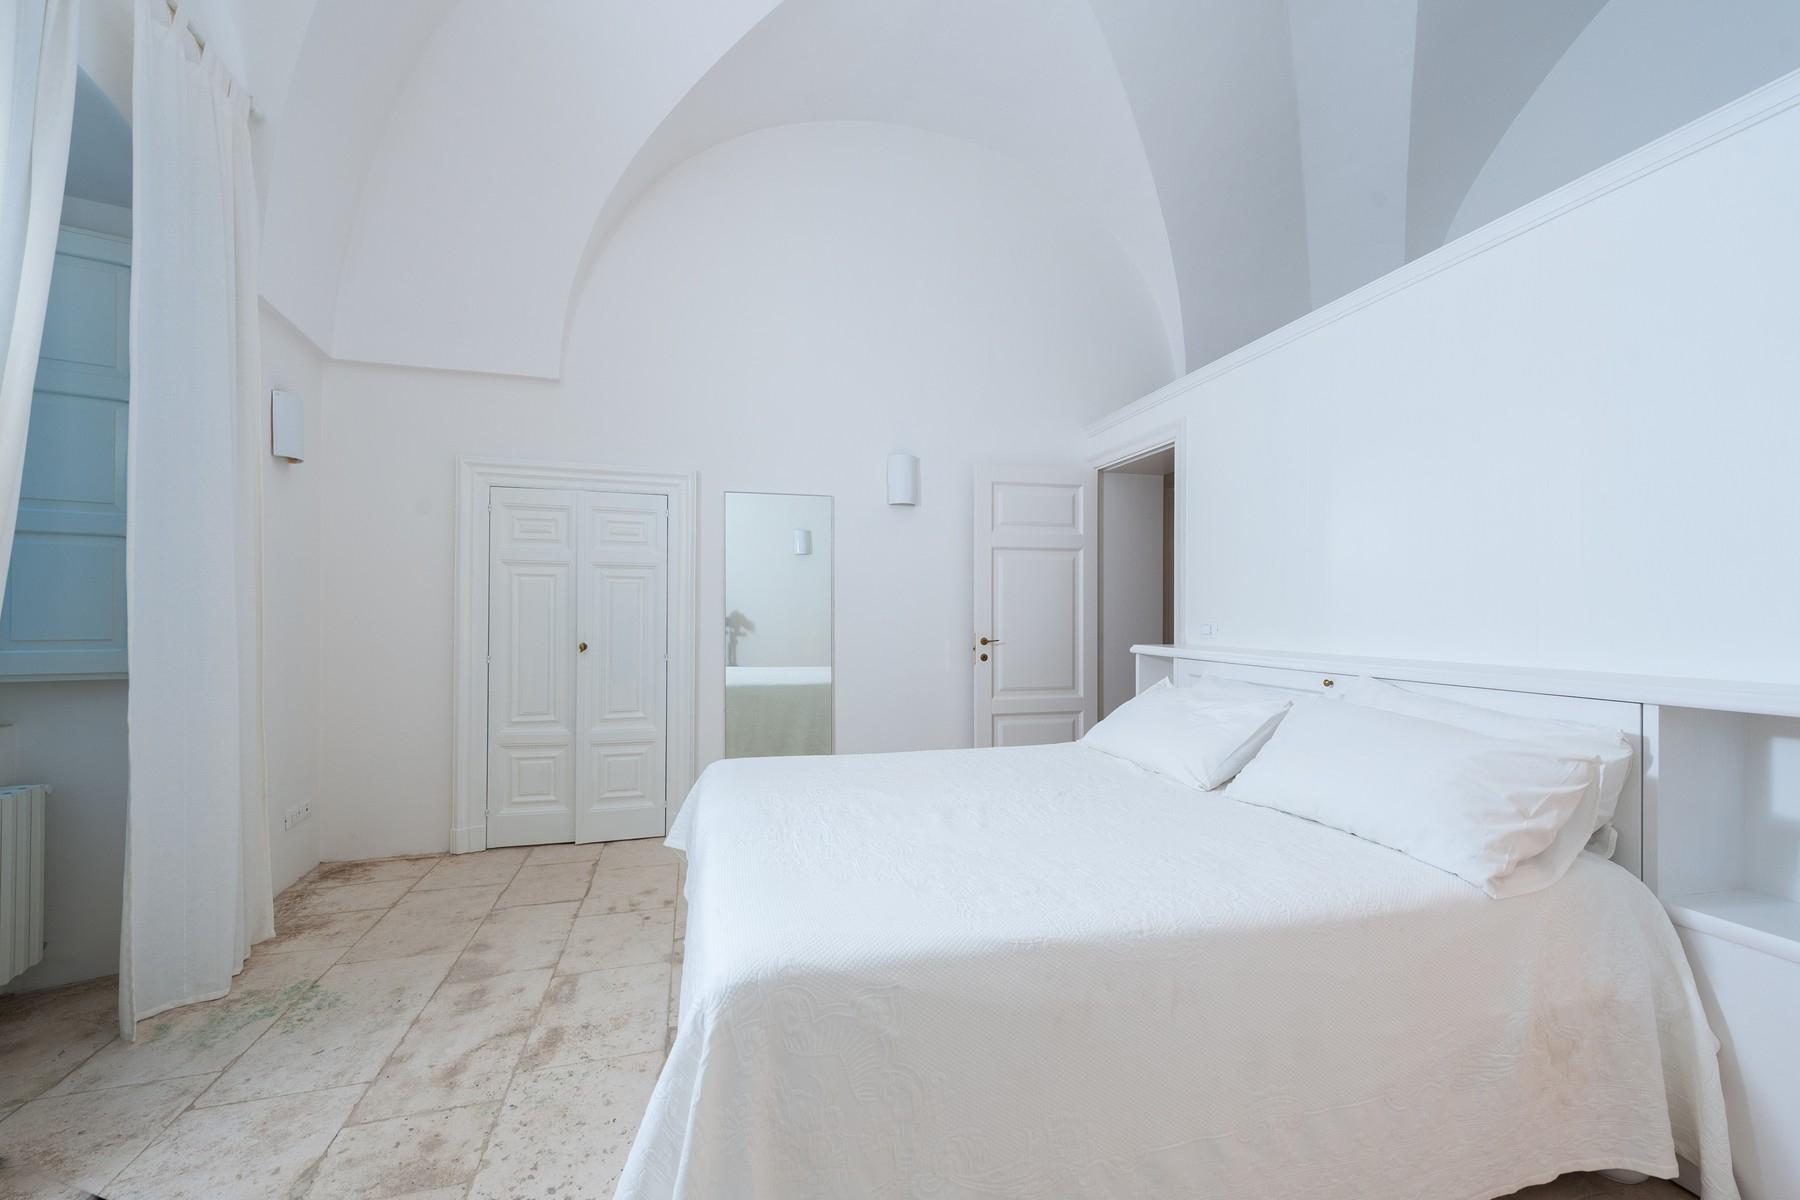 Appartamento in Vendita a Ostuni: 5 locali, 265 mq - Foto 18